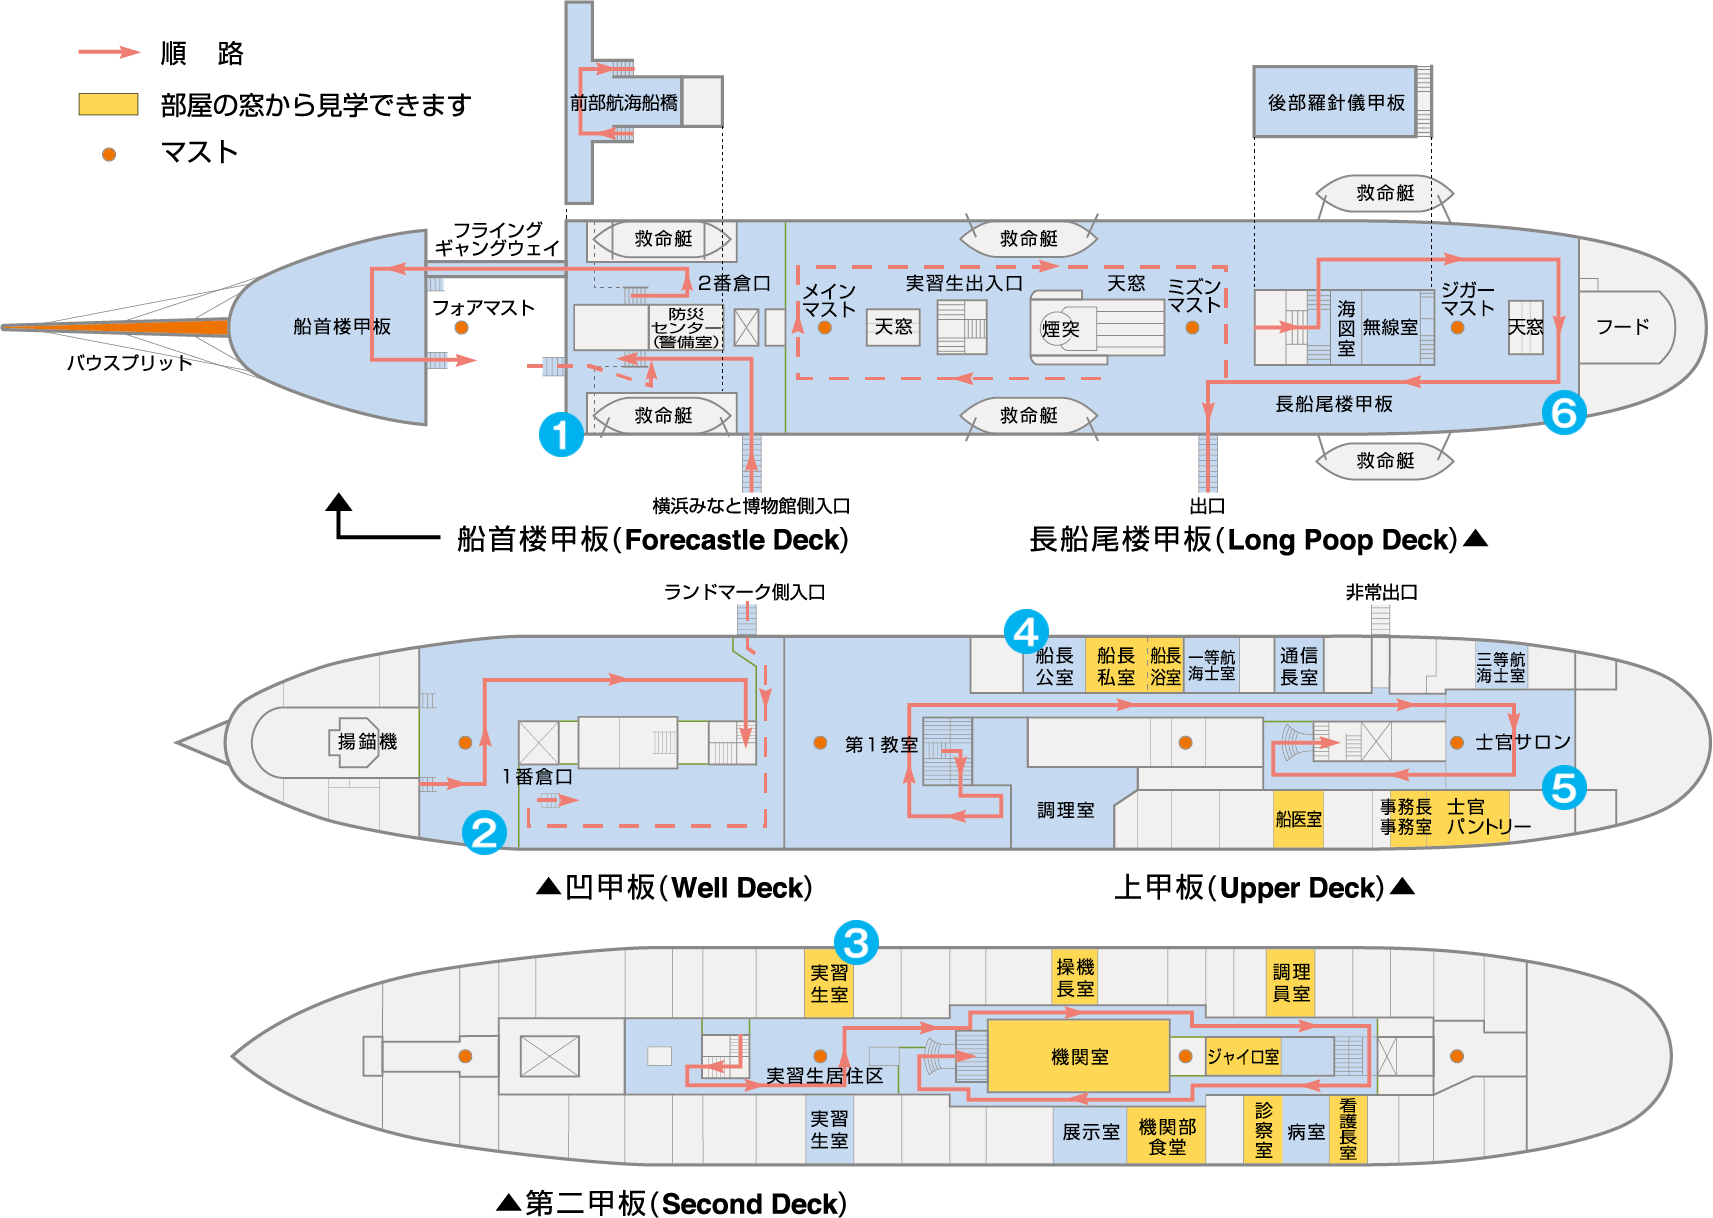 shipmap_1@4x.png